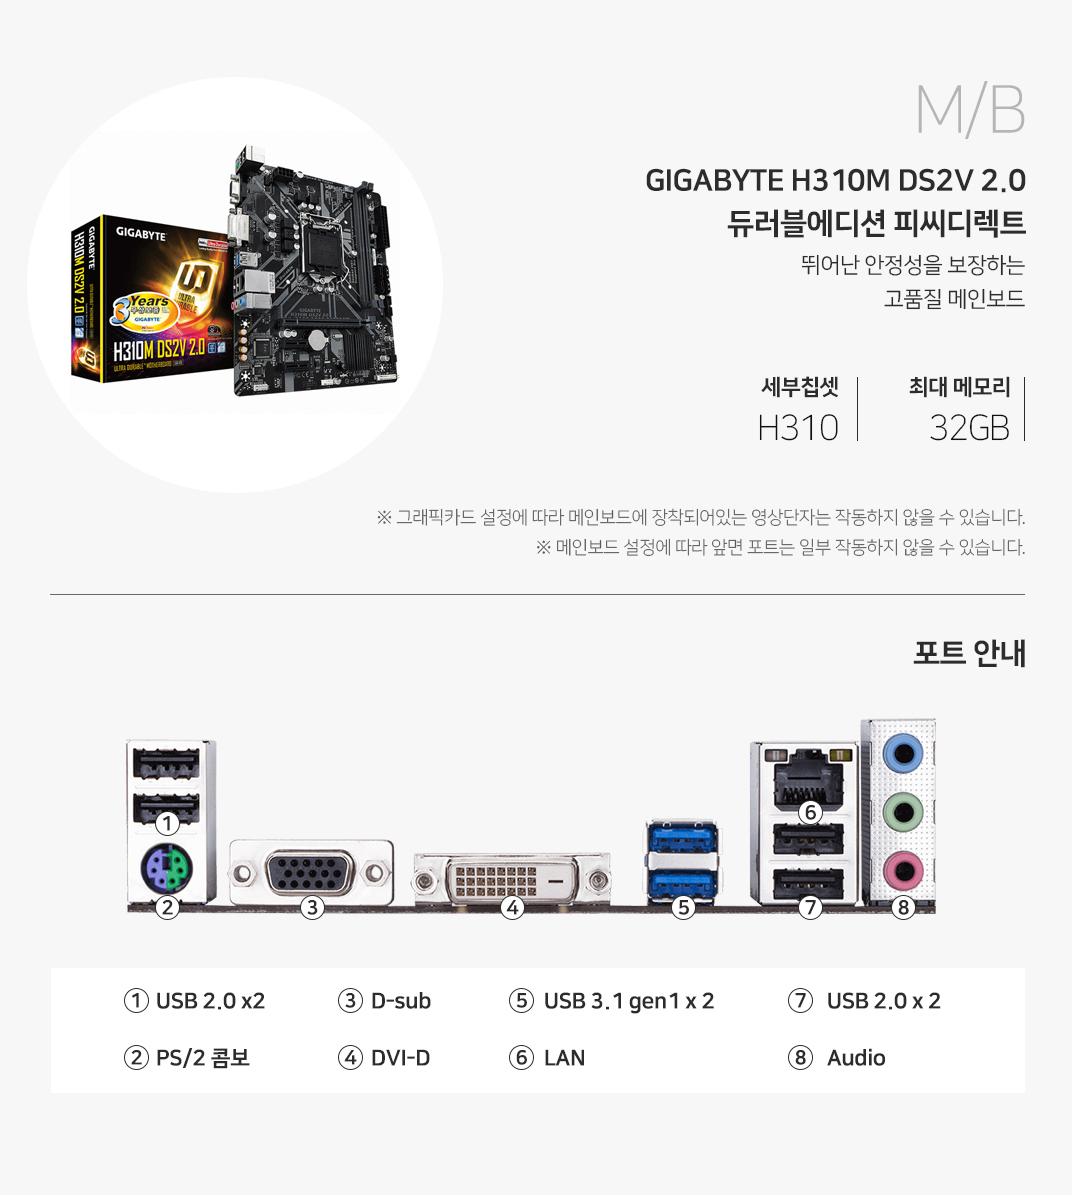 M/B GIGABYTE H310M DS2V 2.0 듀러블에디션 피씨디렉트 뛰어난 안정성을 보장하는 고품질 메인보드 세부 칩셋 H310 최대 메모리 32GB 그래픽 설정에 따라 메인보드에 장착되어 있는 영상 단자는 작동하지 않을 수 있습니다. 메인보드 설정에 따라 앞면 포트는 일부 작동하지 않을 수 있습니다.